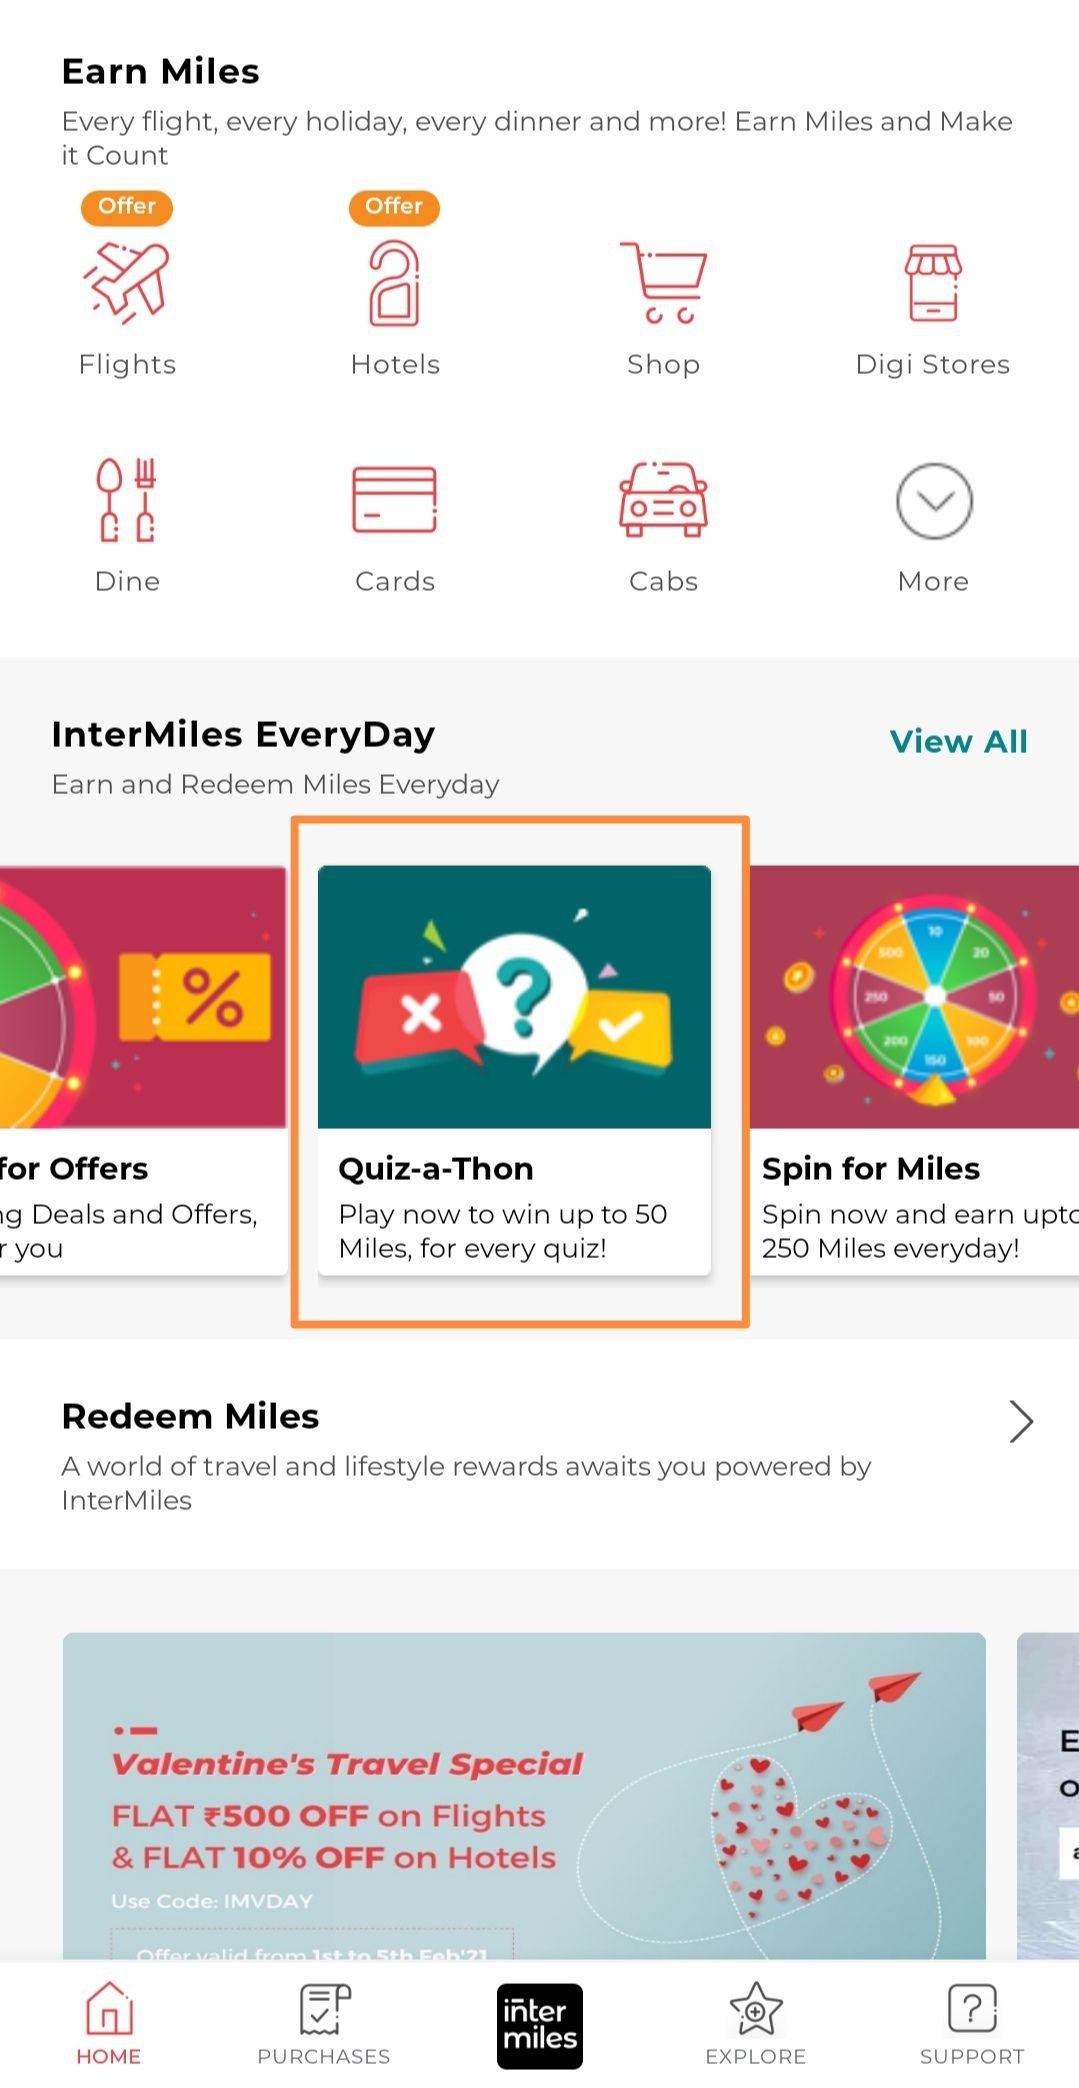 InterMiles Quiz-a-Thon